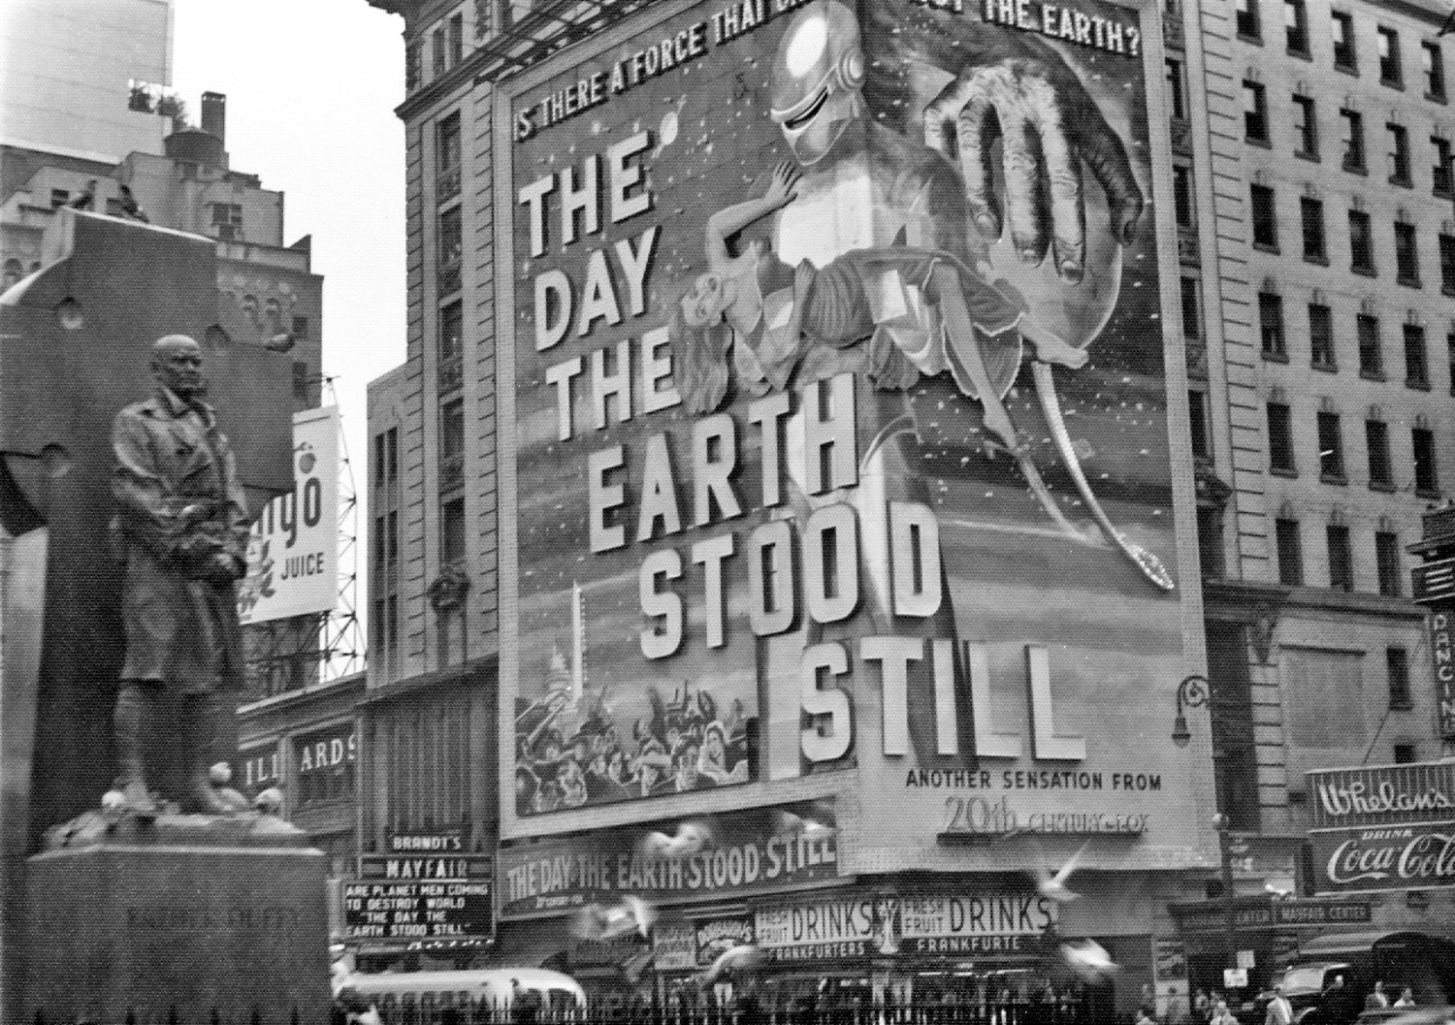 Peter Jingeleski, The day the Earth stood still